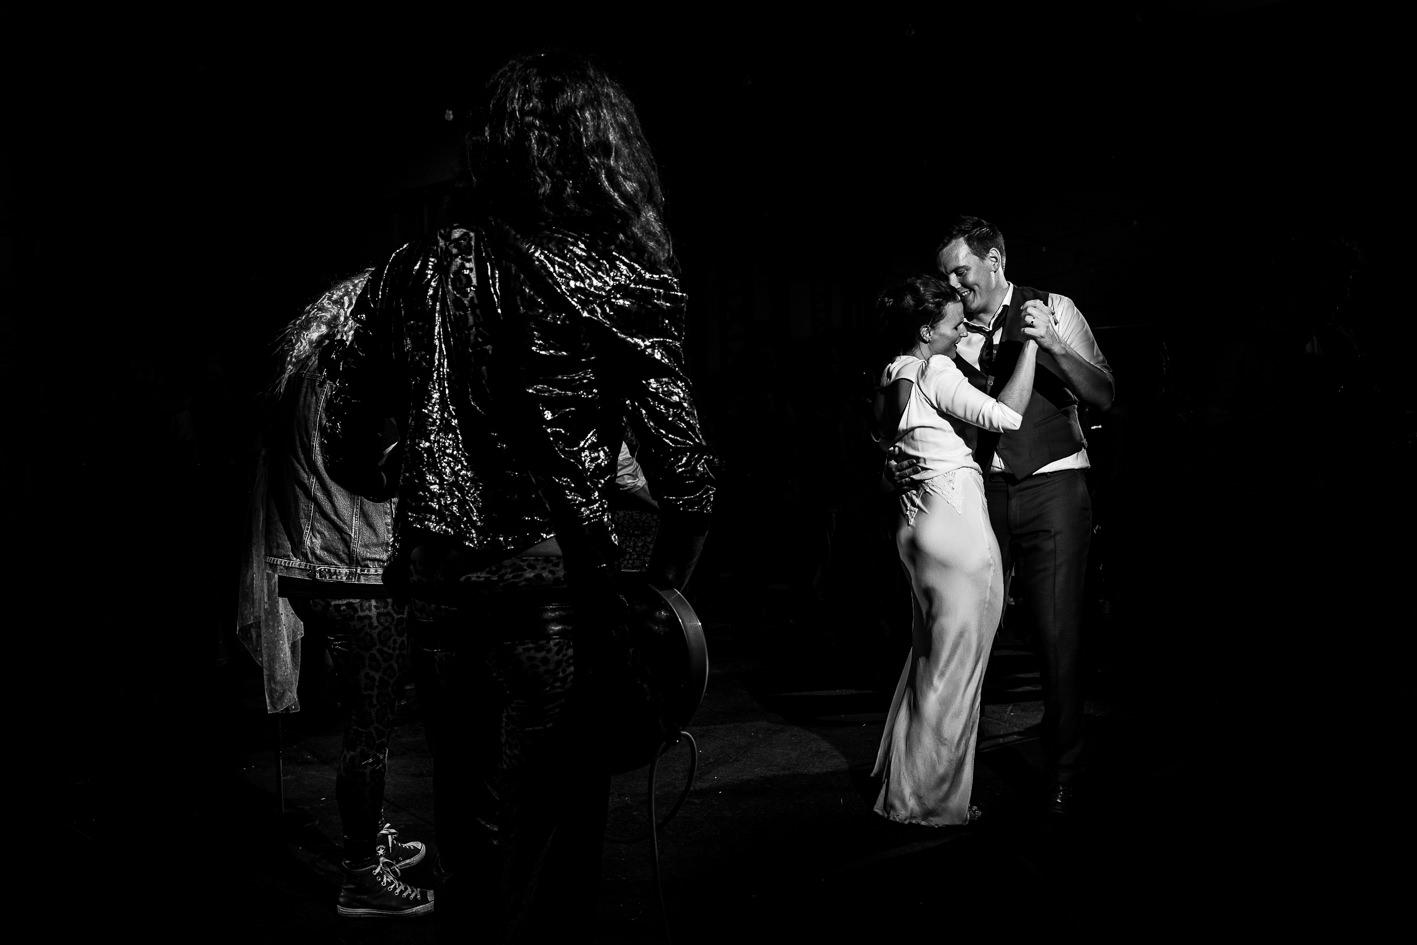 nico van moorhem huwelijksfotograaf openingsdans